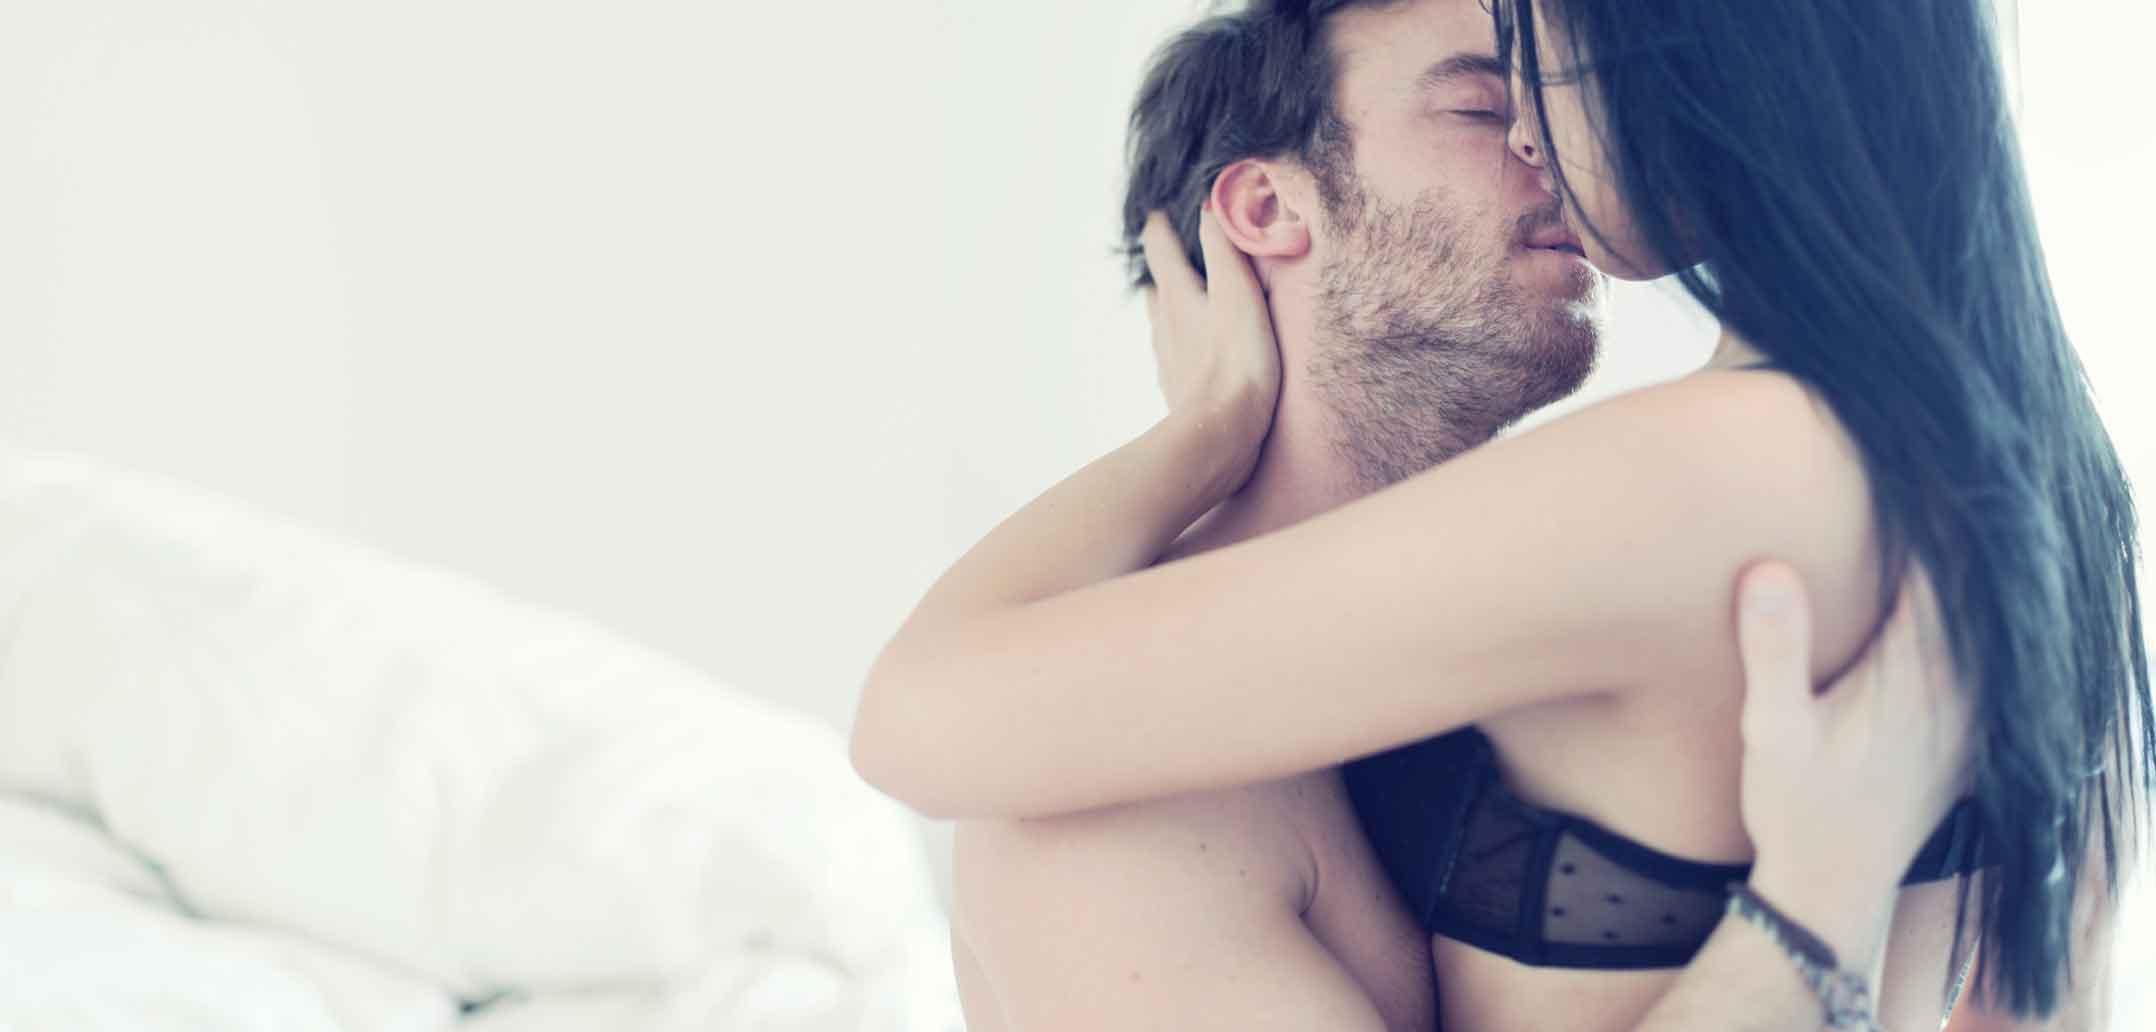 Alibi rockefeller sexual healing vob